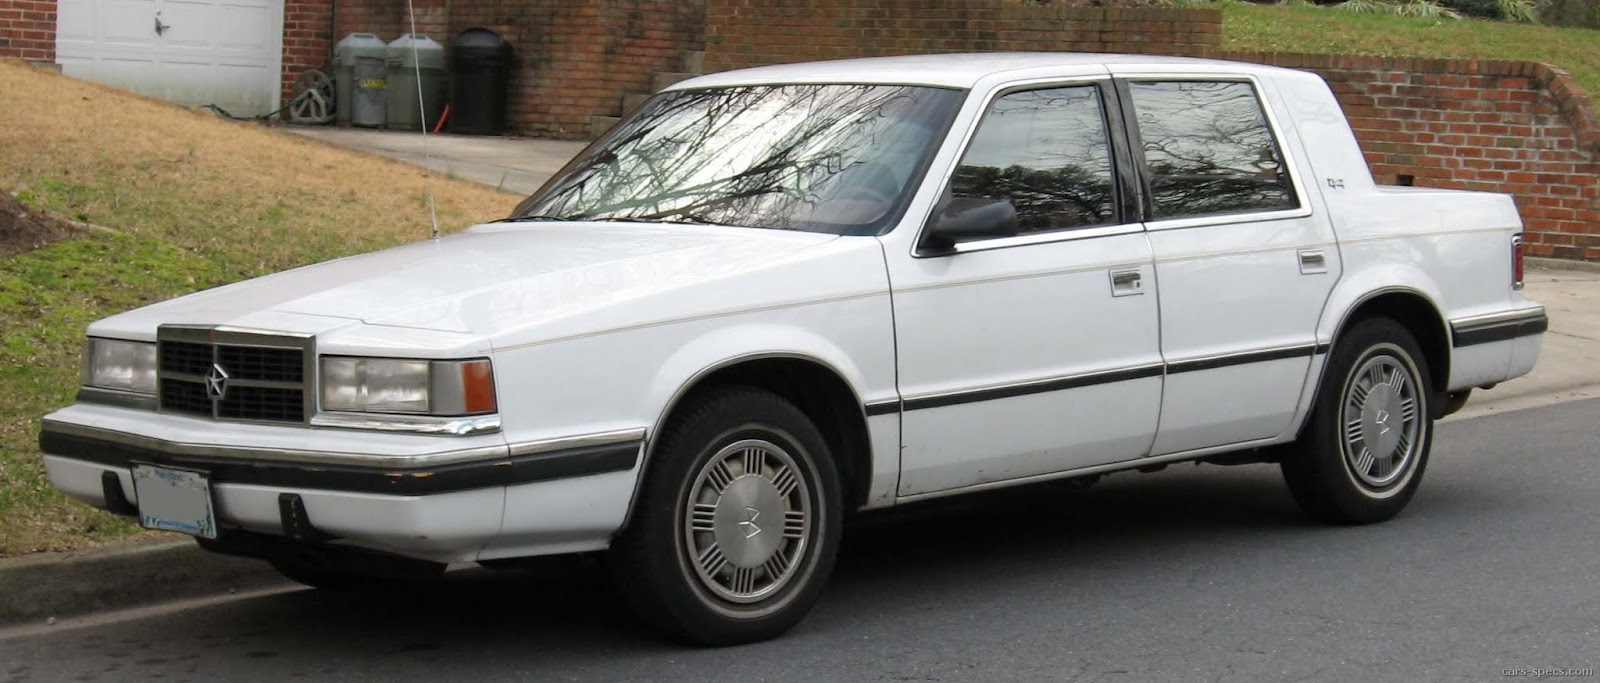 1993 dodge dynasty le sedan 3 0l v6 4 speed automatic